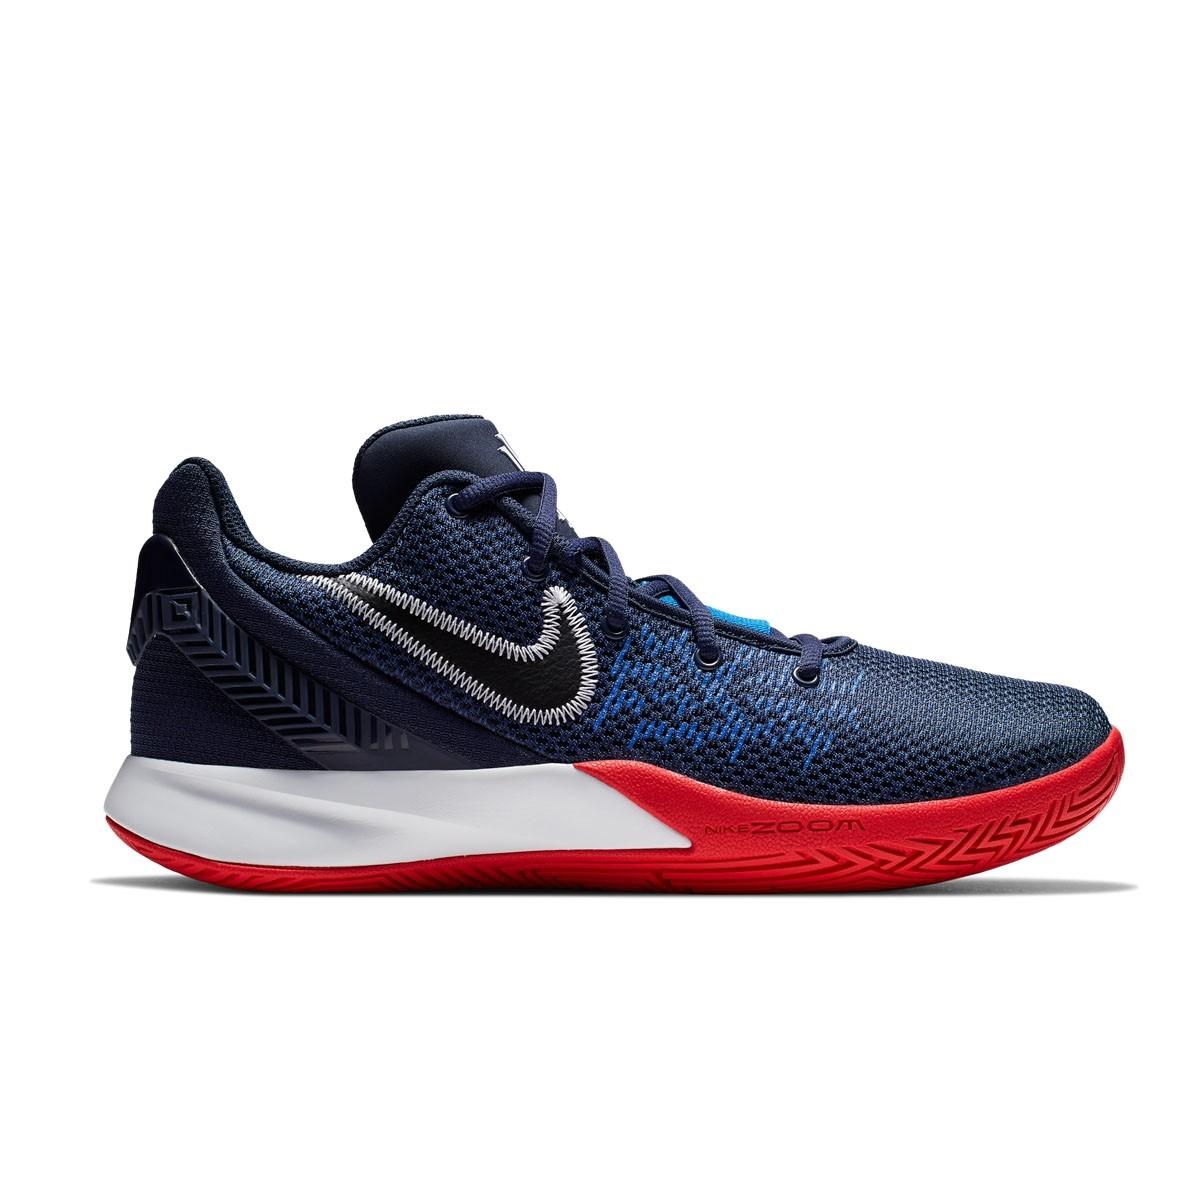 Nike Kyrie Flytrap II 'USA'